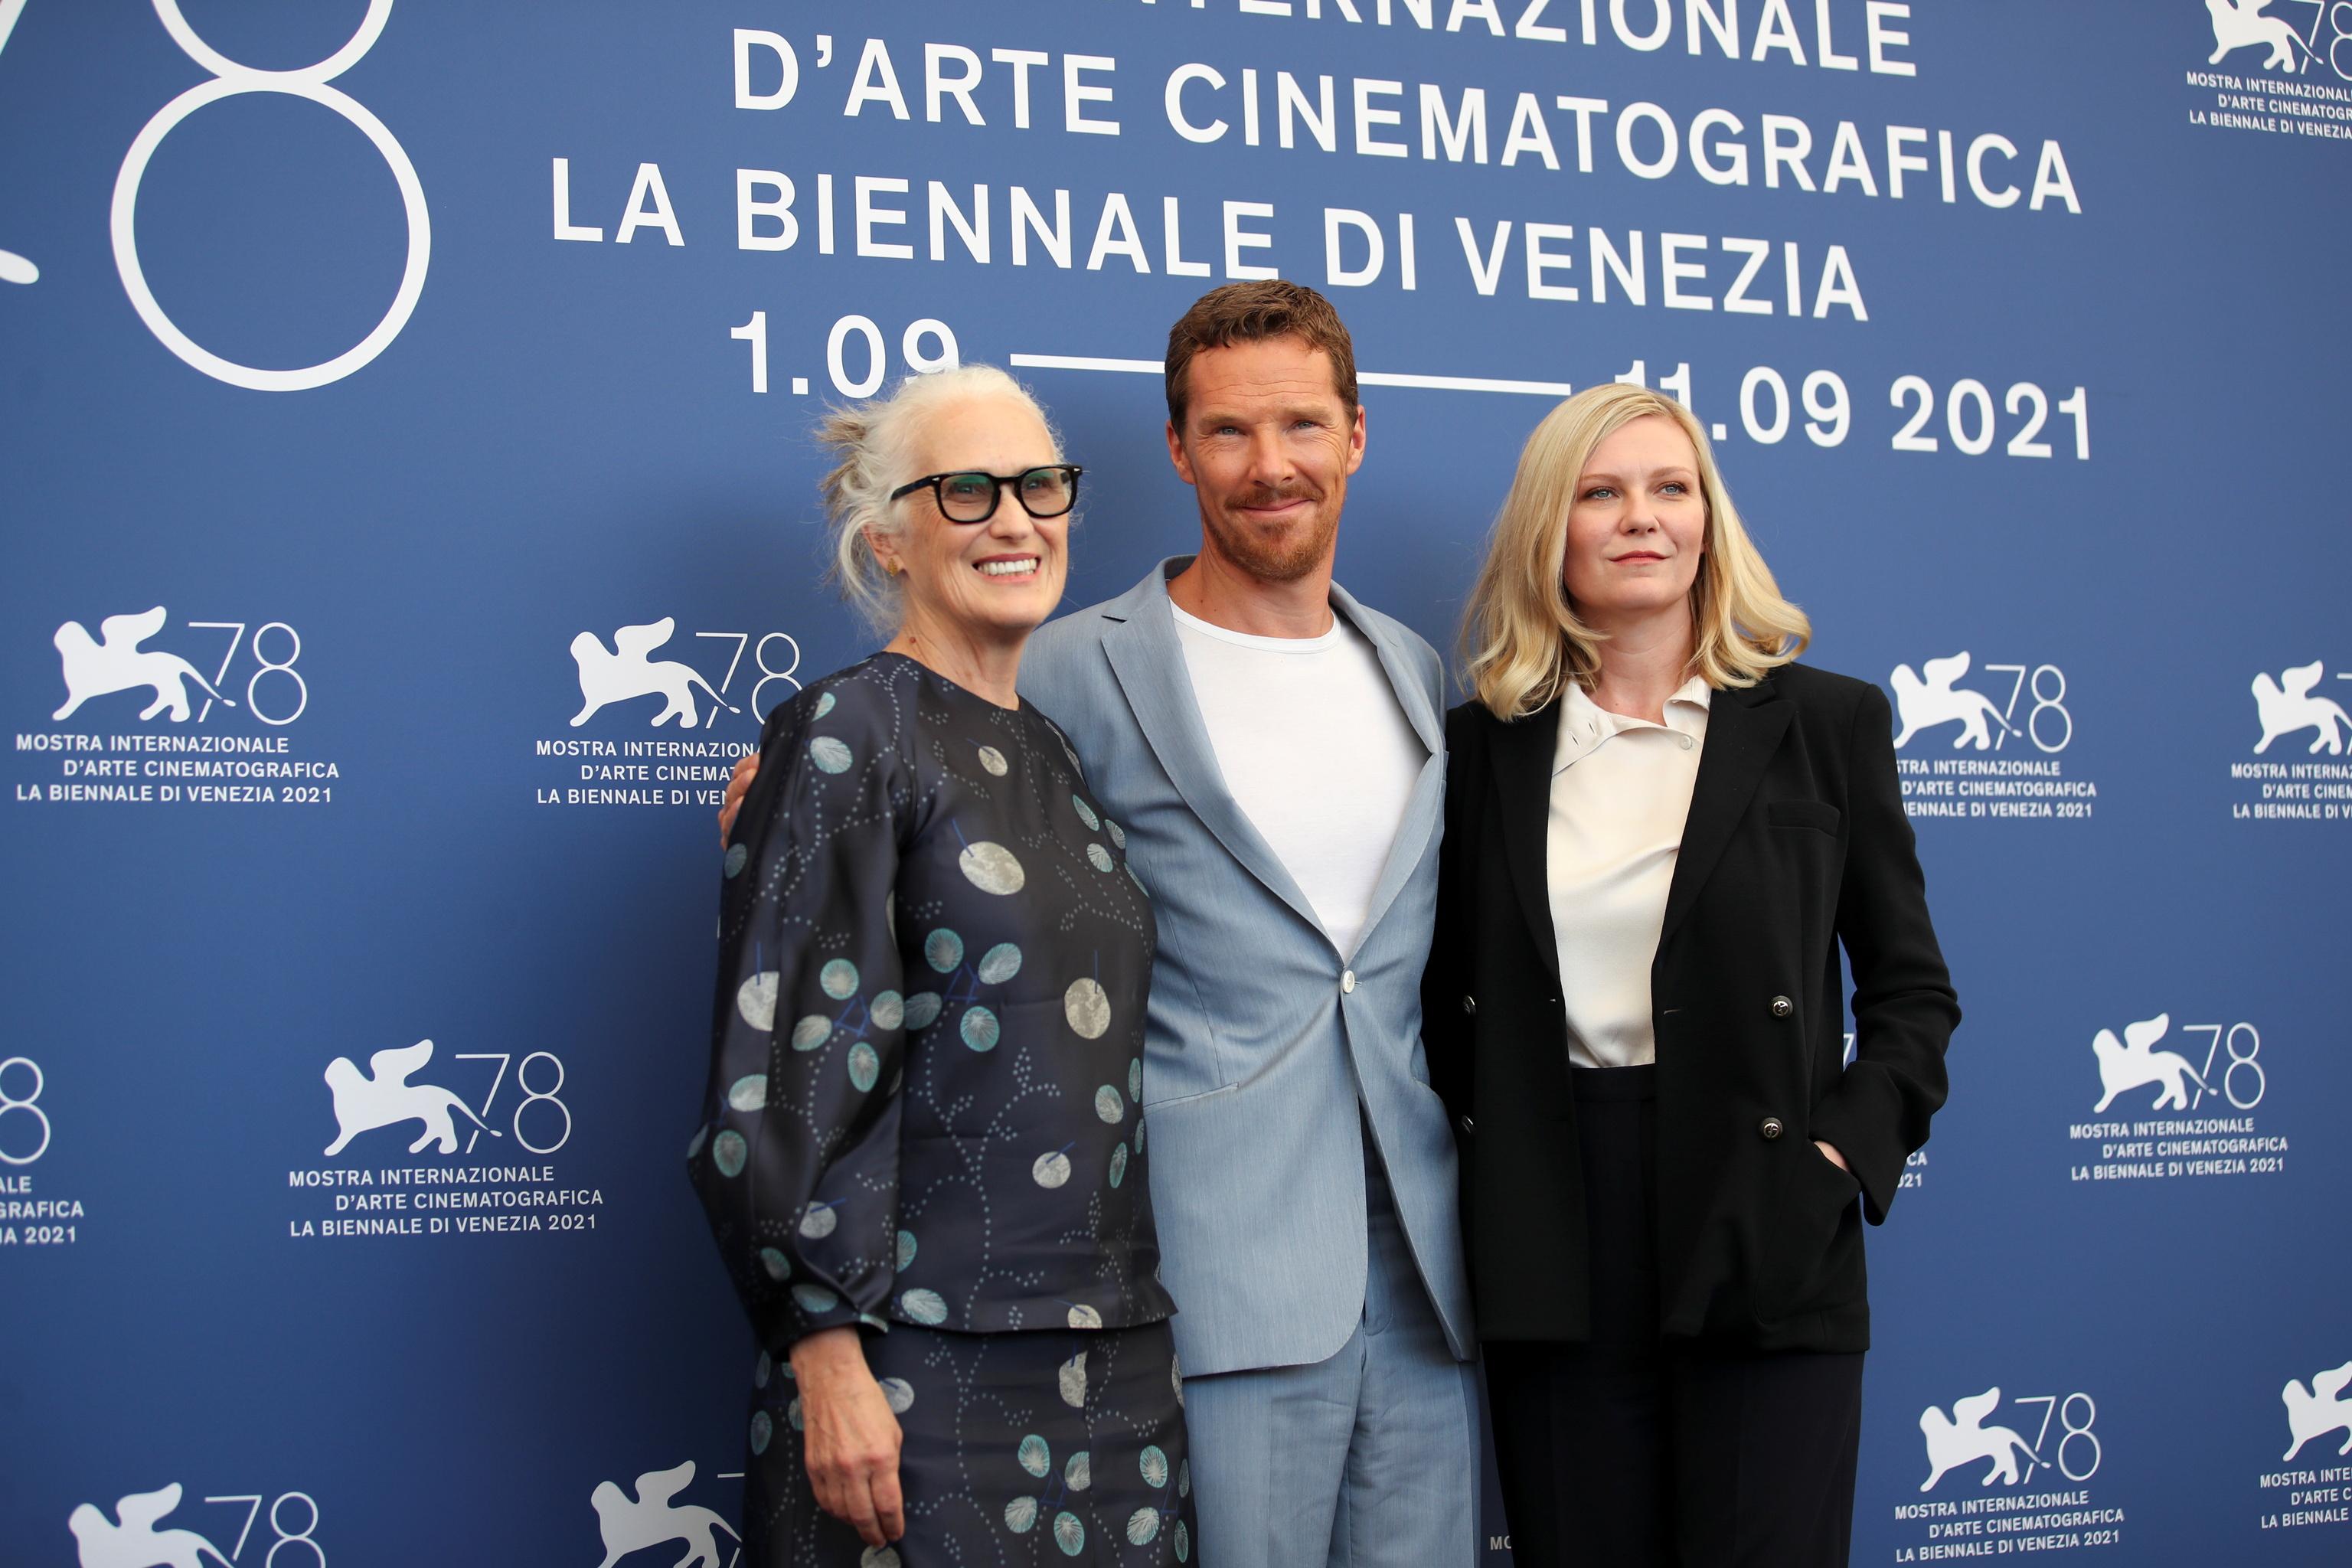 Jane Campion, Benedict Cumberbatch y Kirsten Dunst.